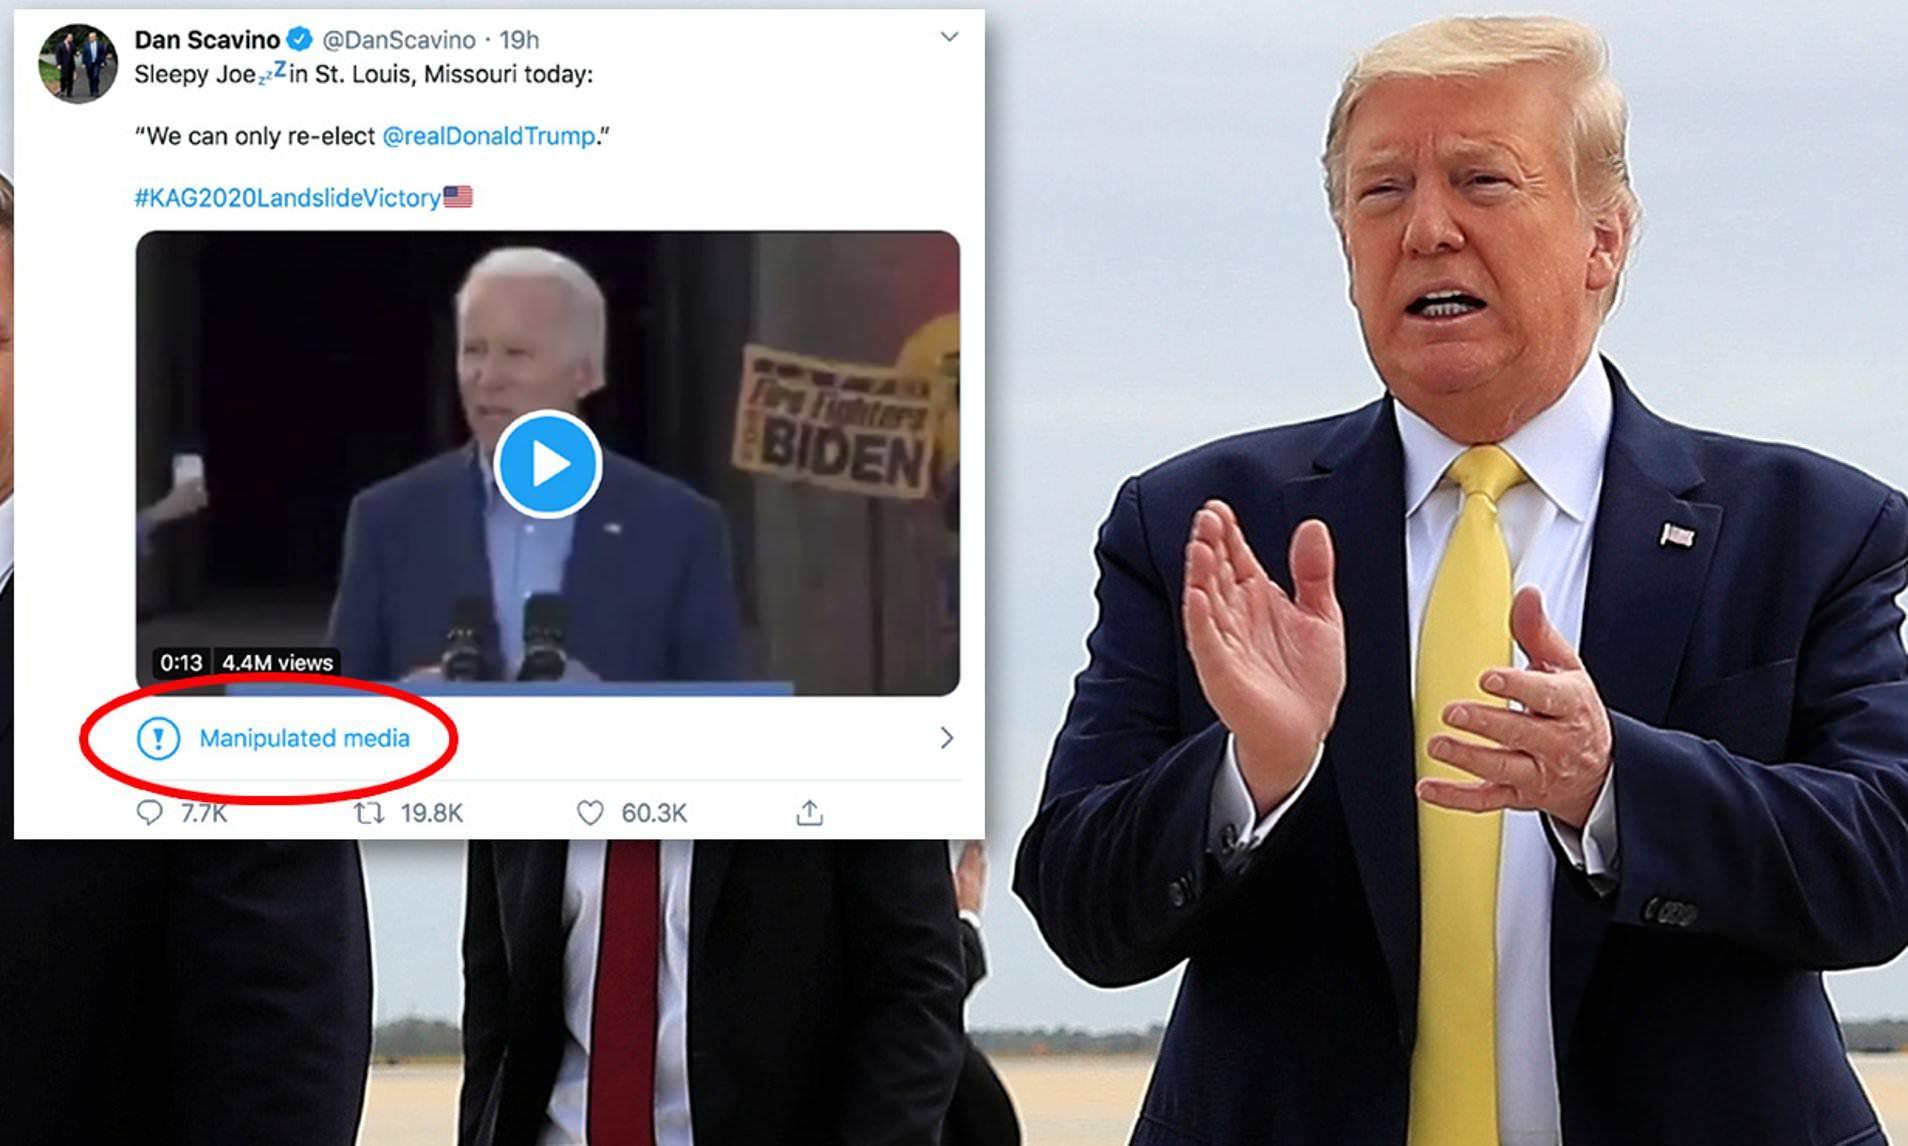 Twitter ilk damgayı Trump'ın 'retweet'ine koydu: 'Manipüle edilmiş medya' - Journo